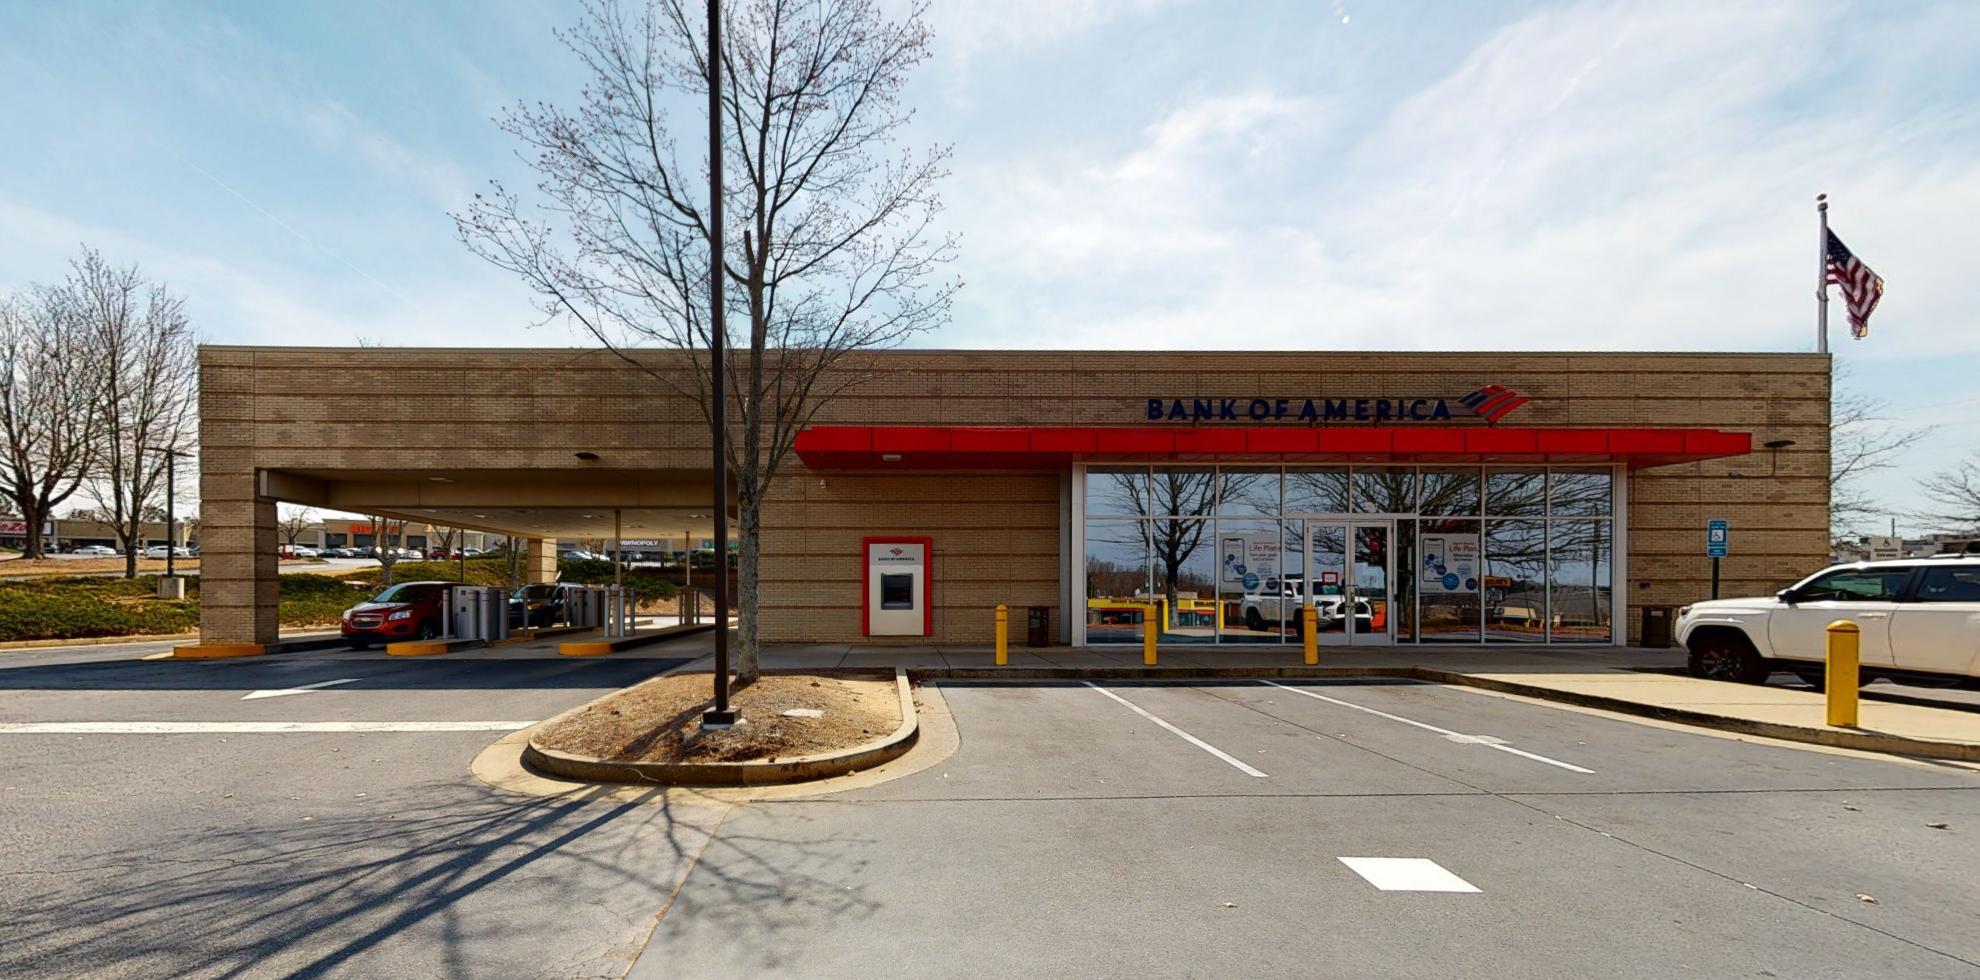 Bank of America financial center with drive-thru ATM   501 Tri County Plz, Cumming, GA 30040